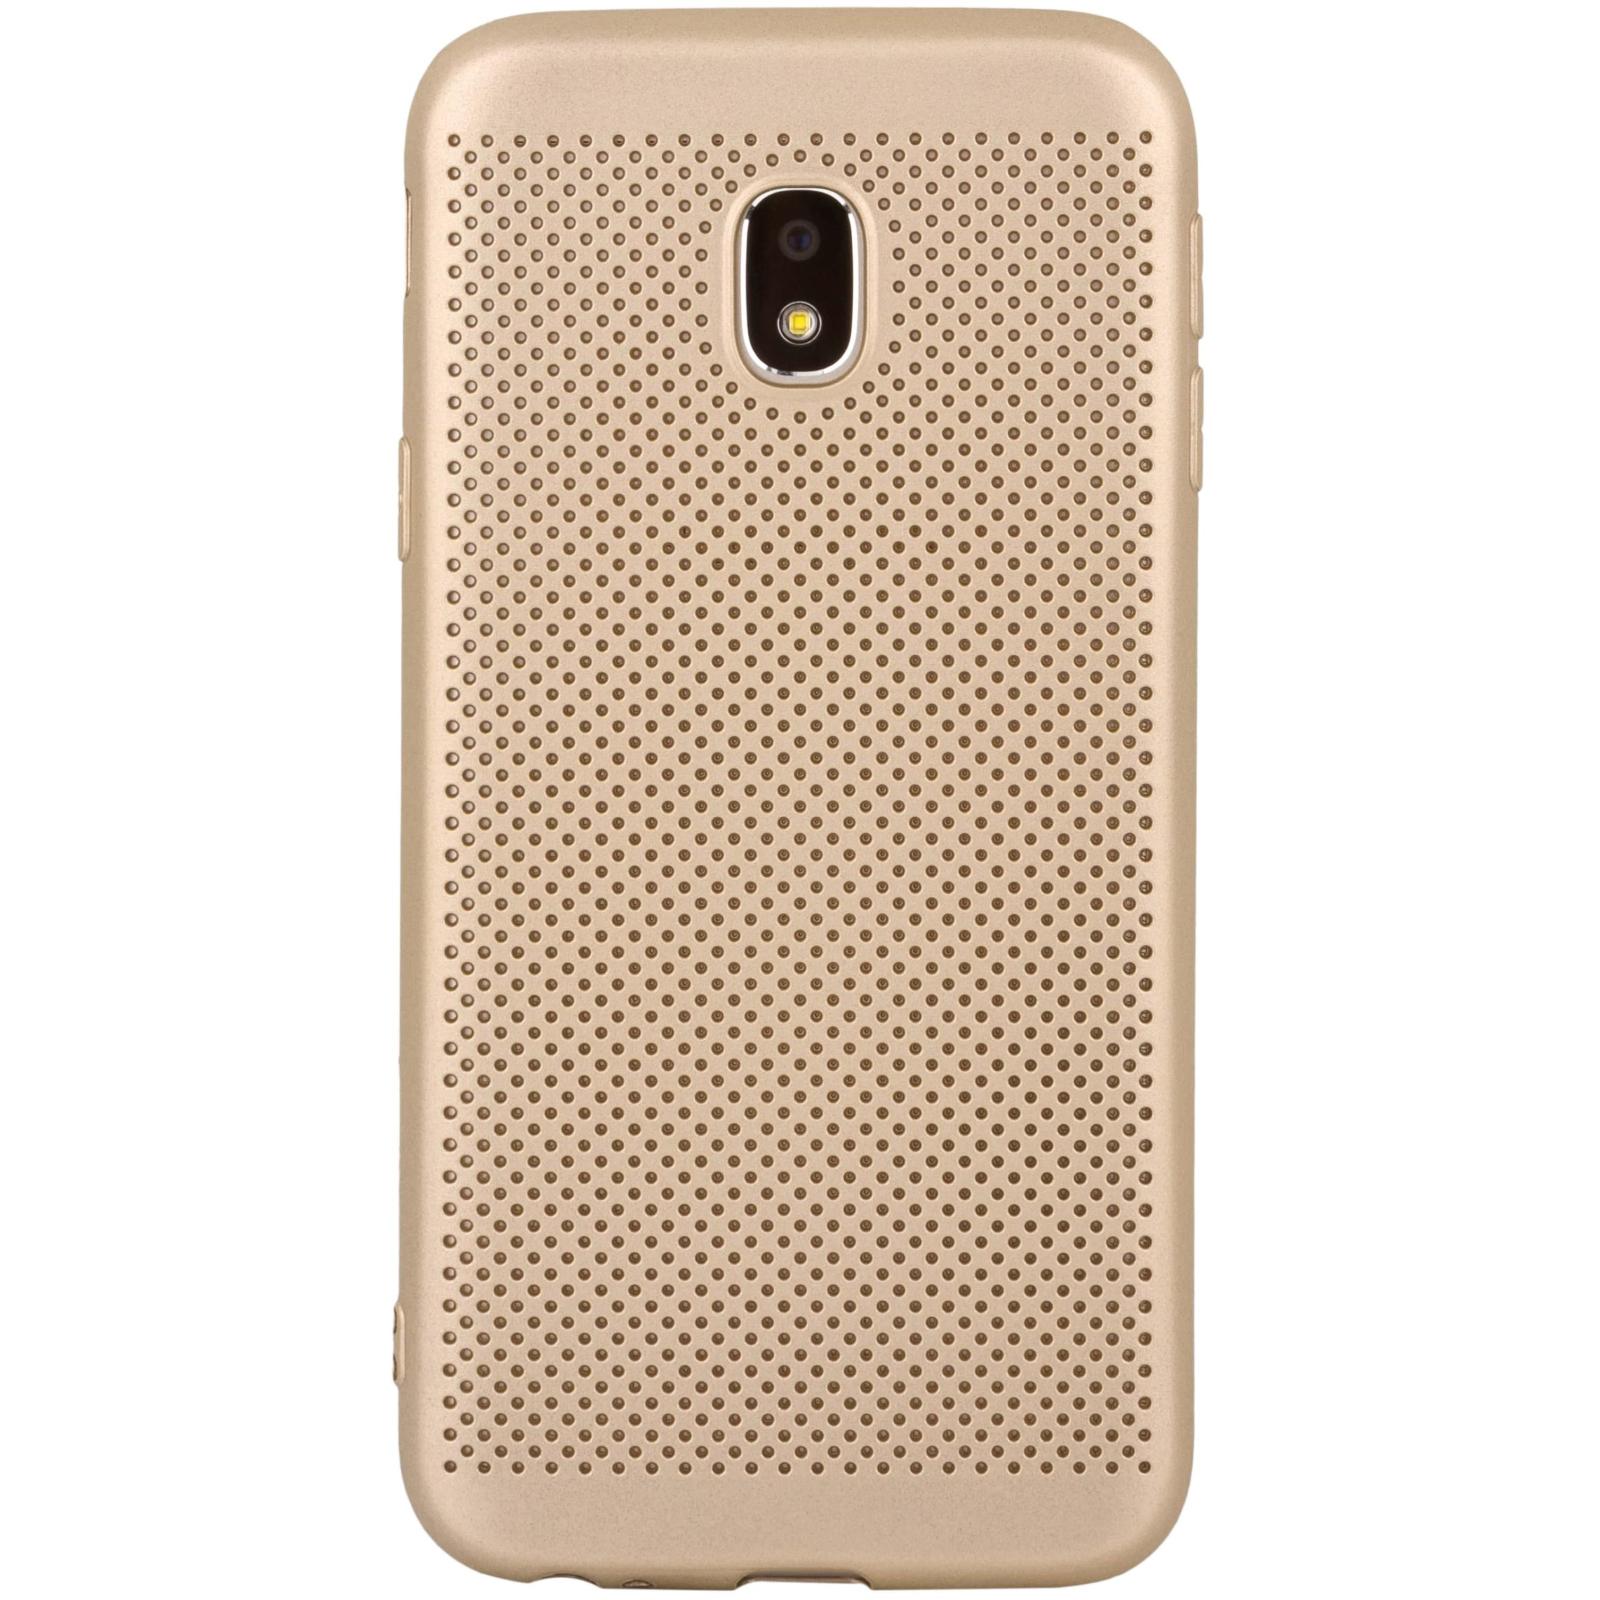 Чехол для моб. телефона MakeFuture Moon Case (TPU) для Samsung J3 2017 (J330) Gold (MCM-SJ330GD)